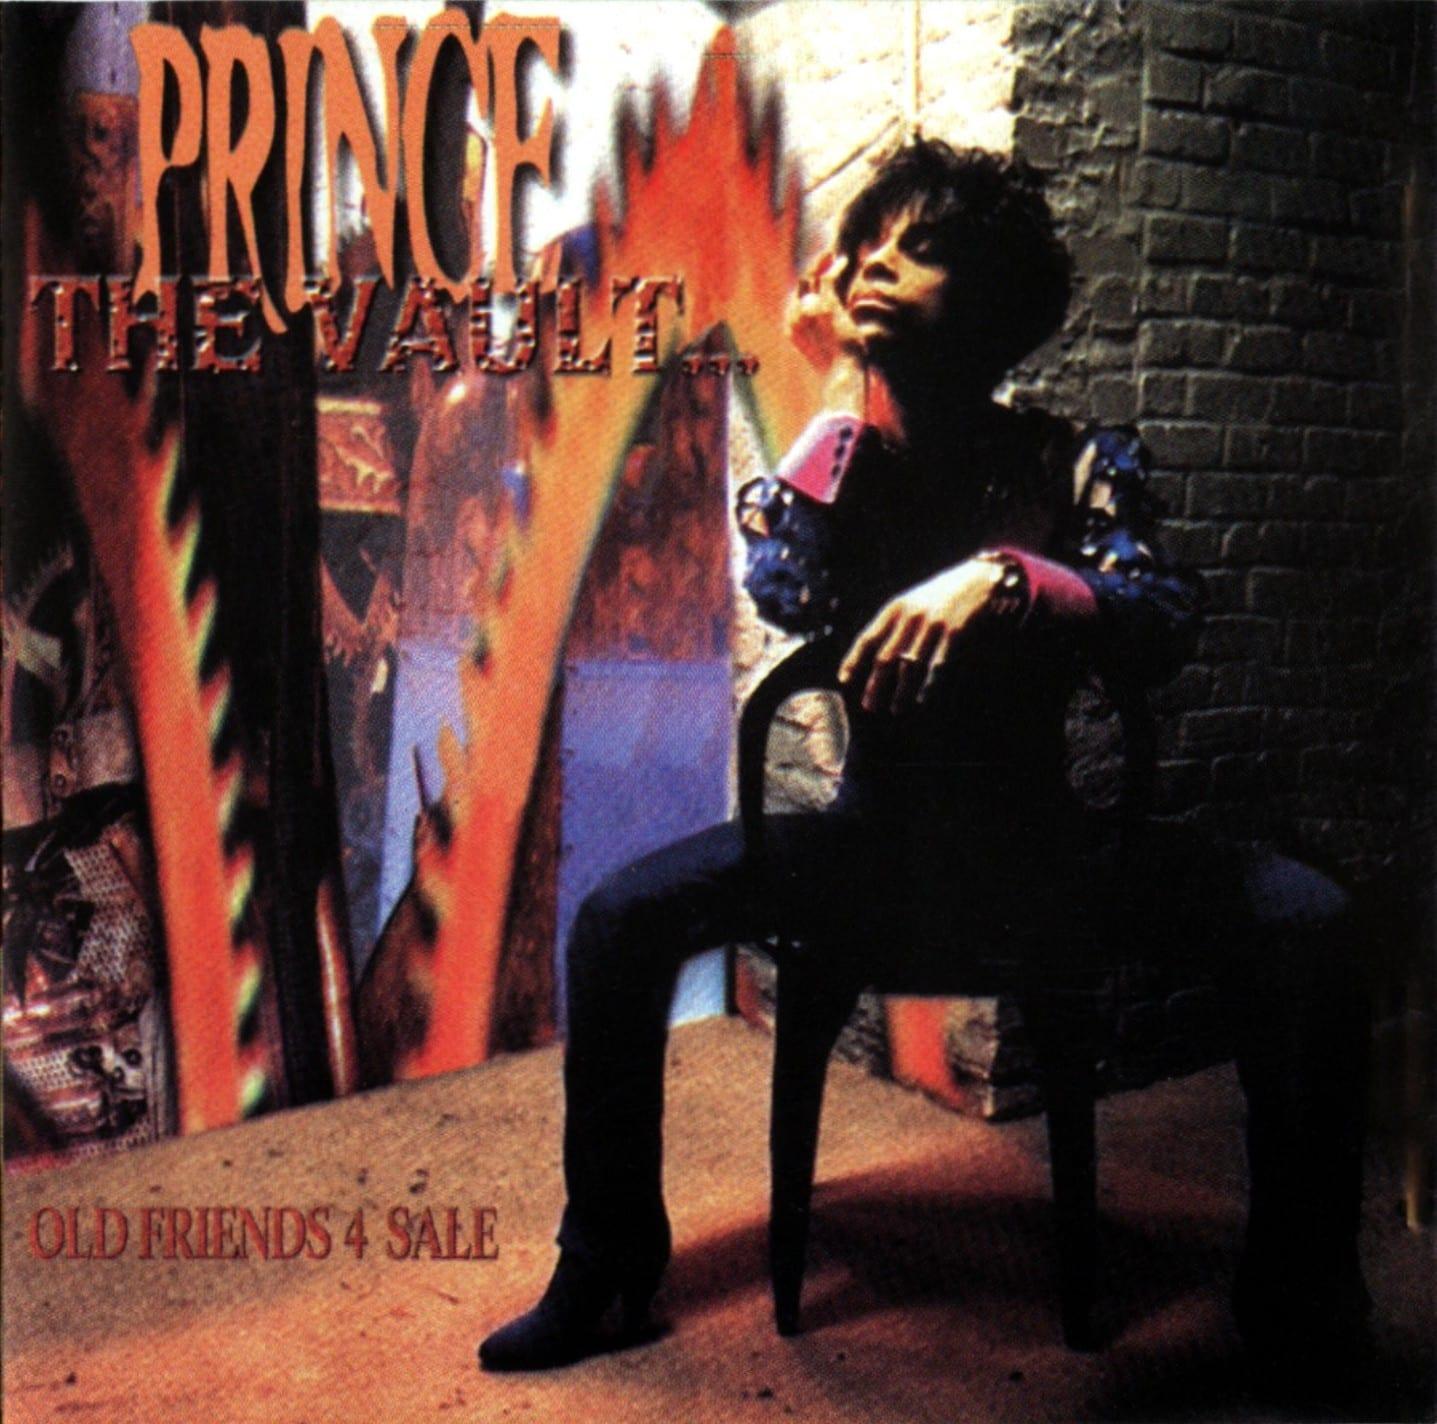 Prince - Dream Factory (Unreleased) (2000) CD 8